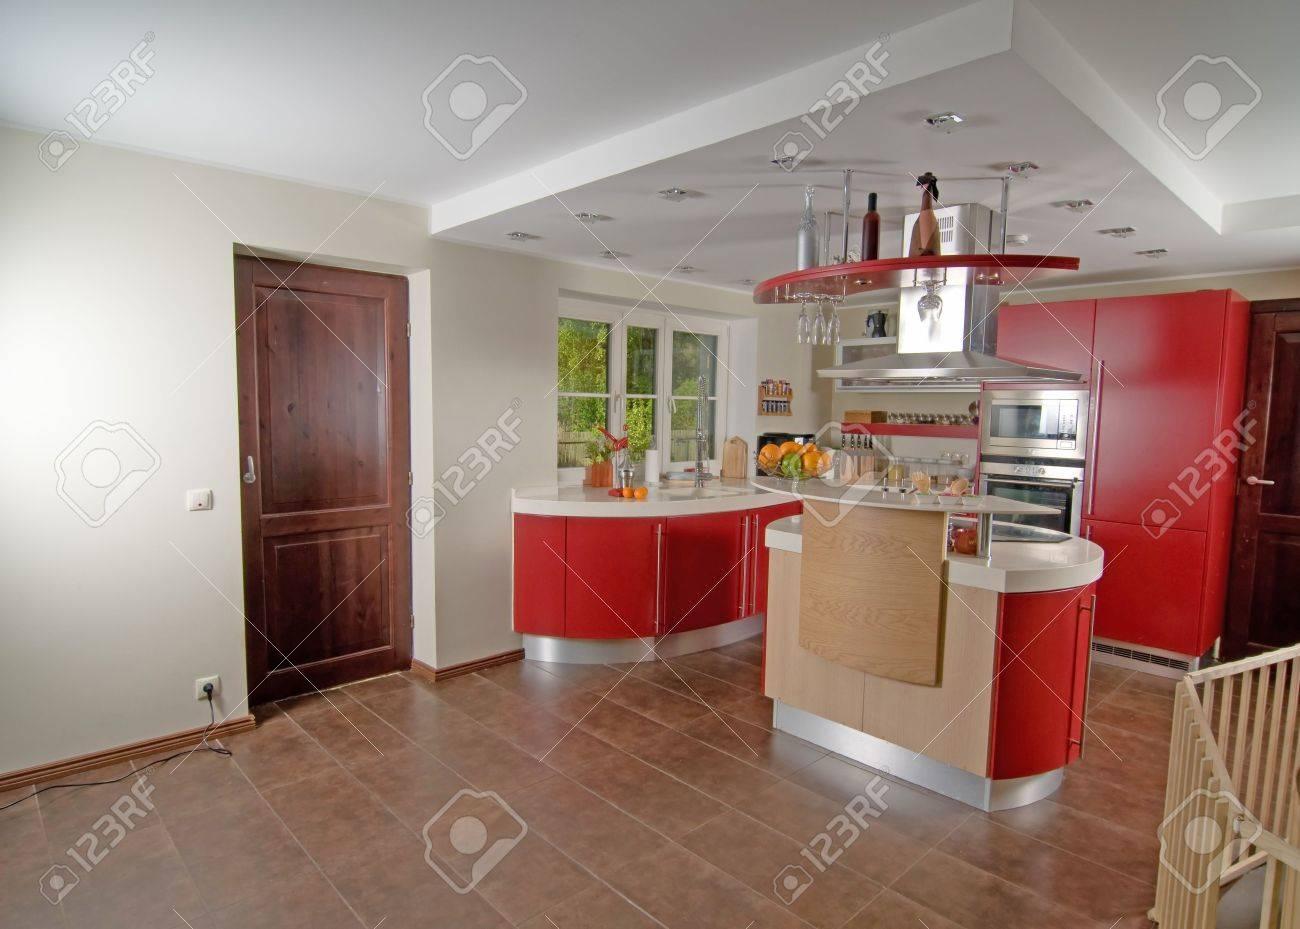 Modern Kitchen Interiors Shot Of Beautiful Red Modern Kitchen Interior Stock Photo